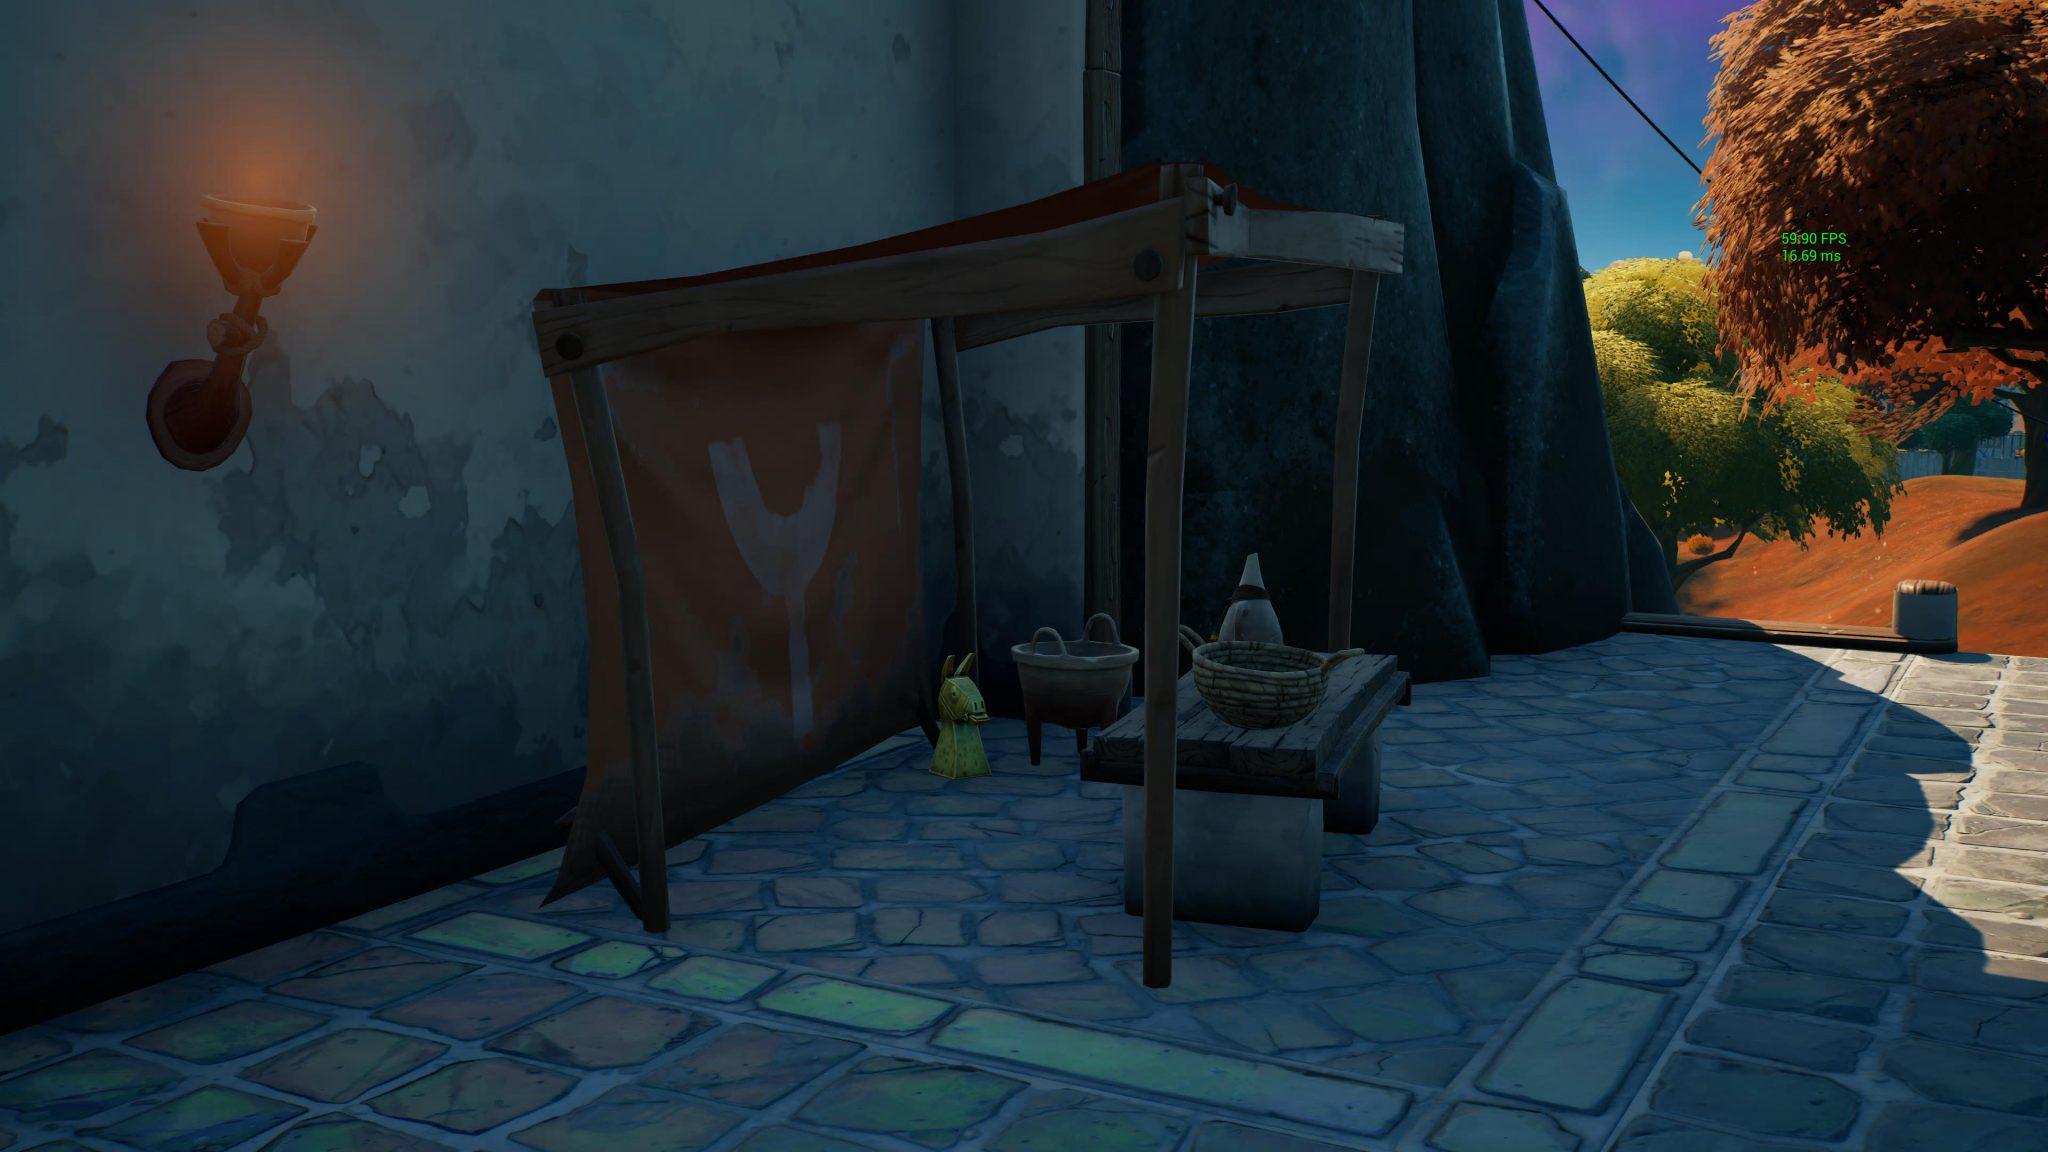 Golden Artifact Location 3 in Fortnite